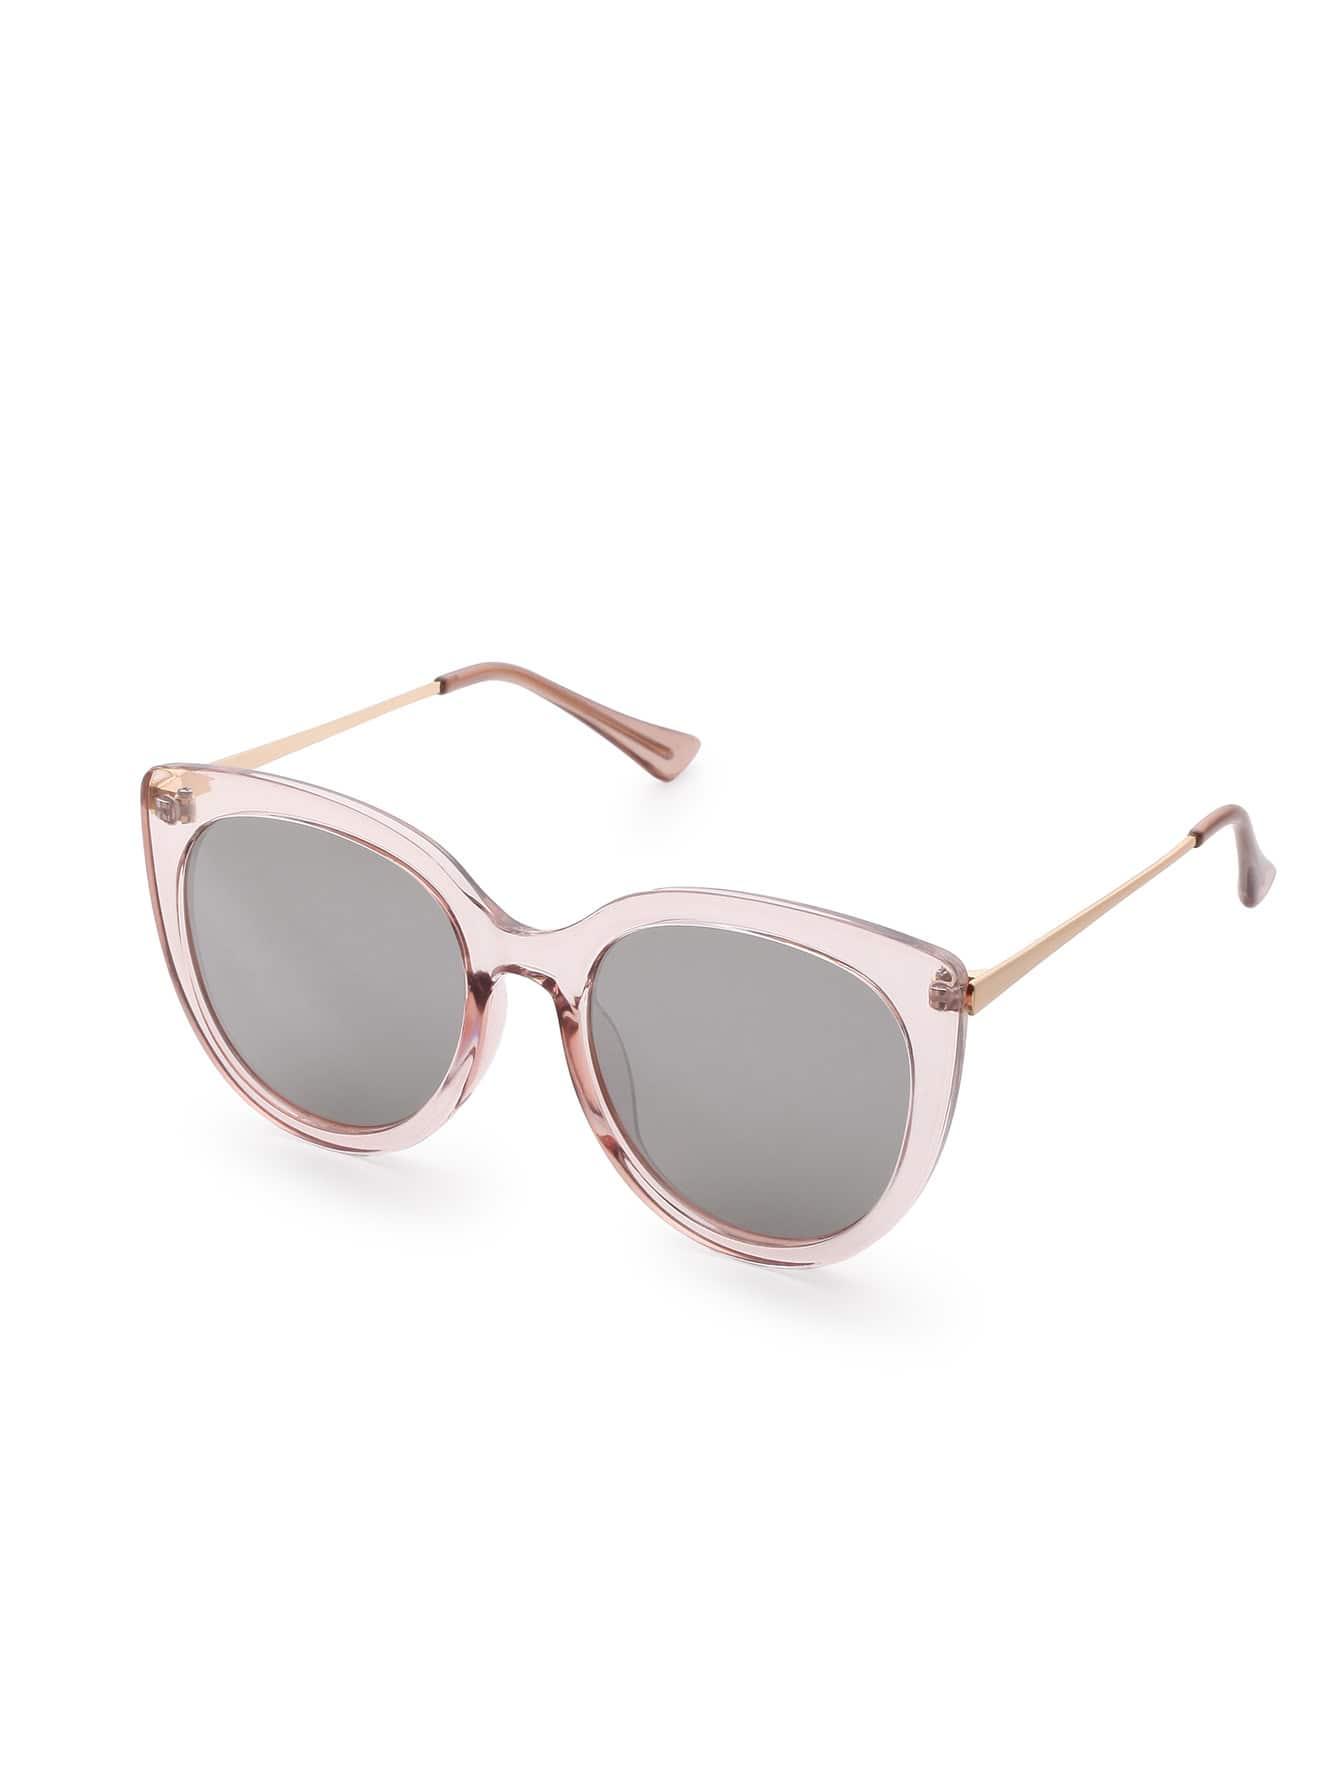 Pink Frame Grey Lens Cat Eye Sunglasses sunglass170324304